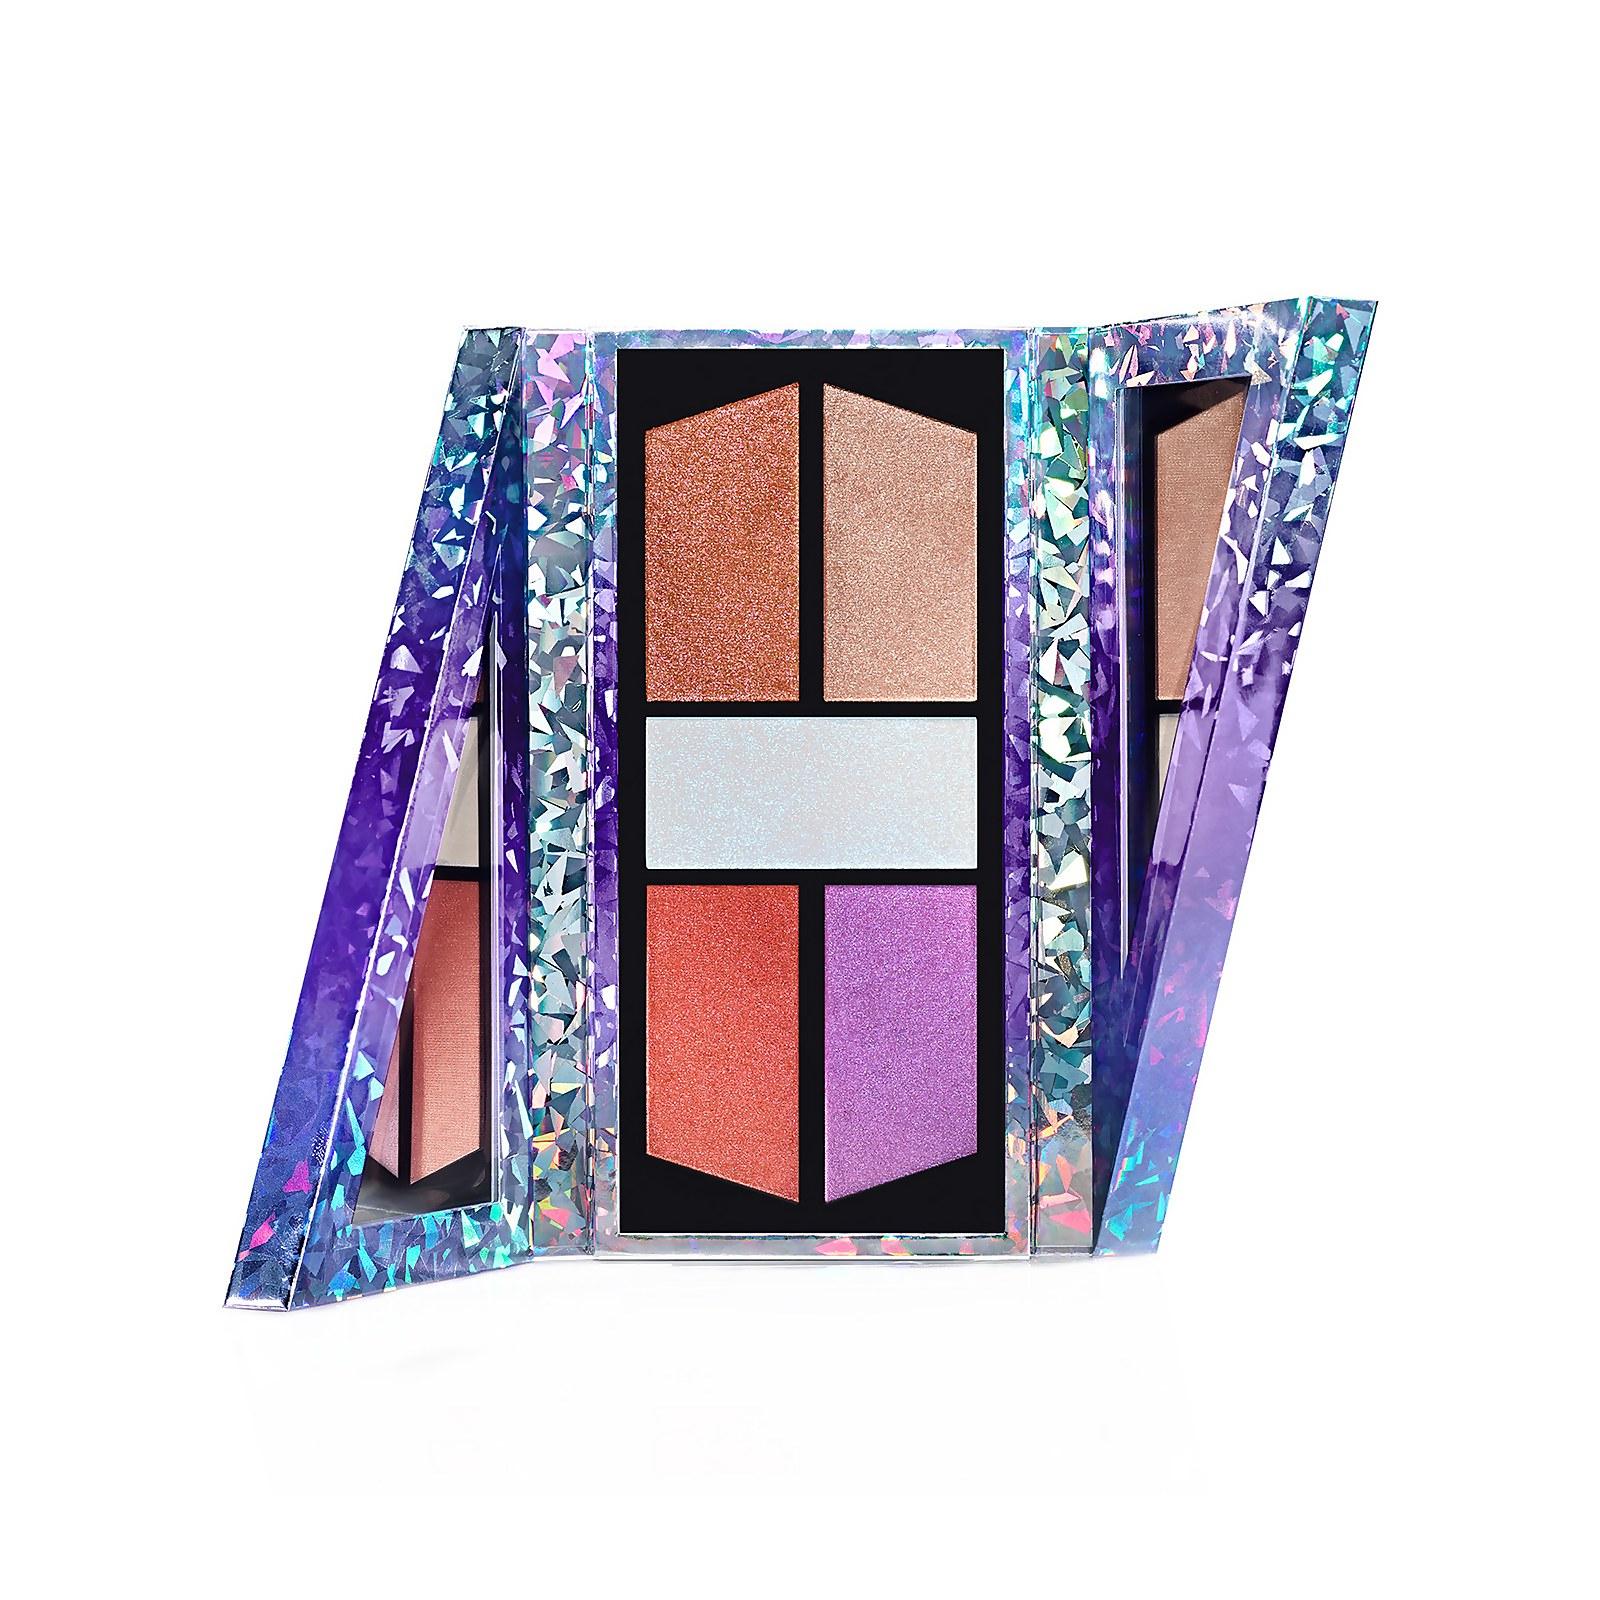 BECCA x Barbie Ferreira Prismatica Face and Eye Palette £14.65 Delivered @ LookFantastic